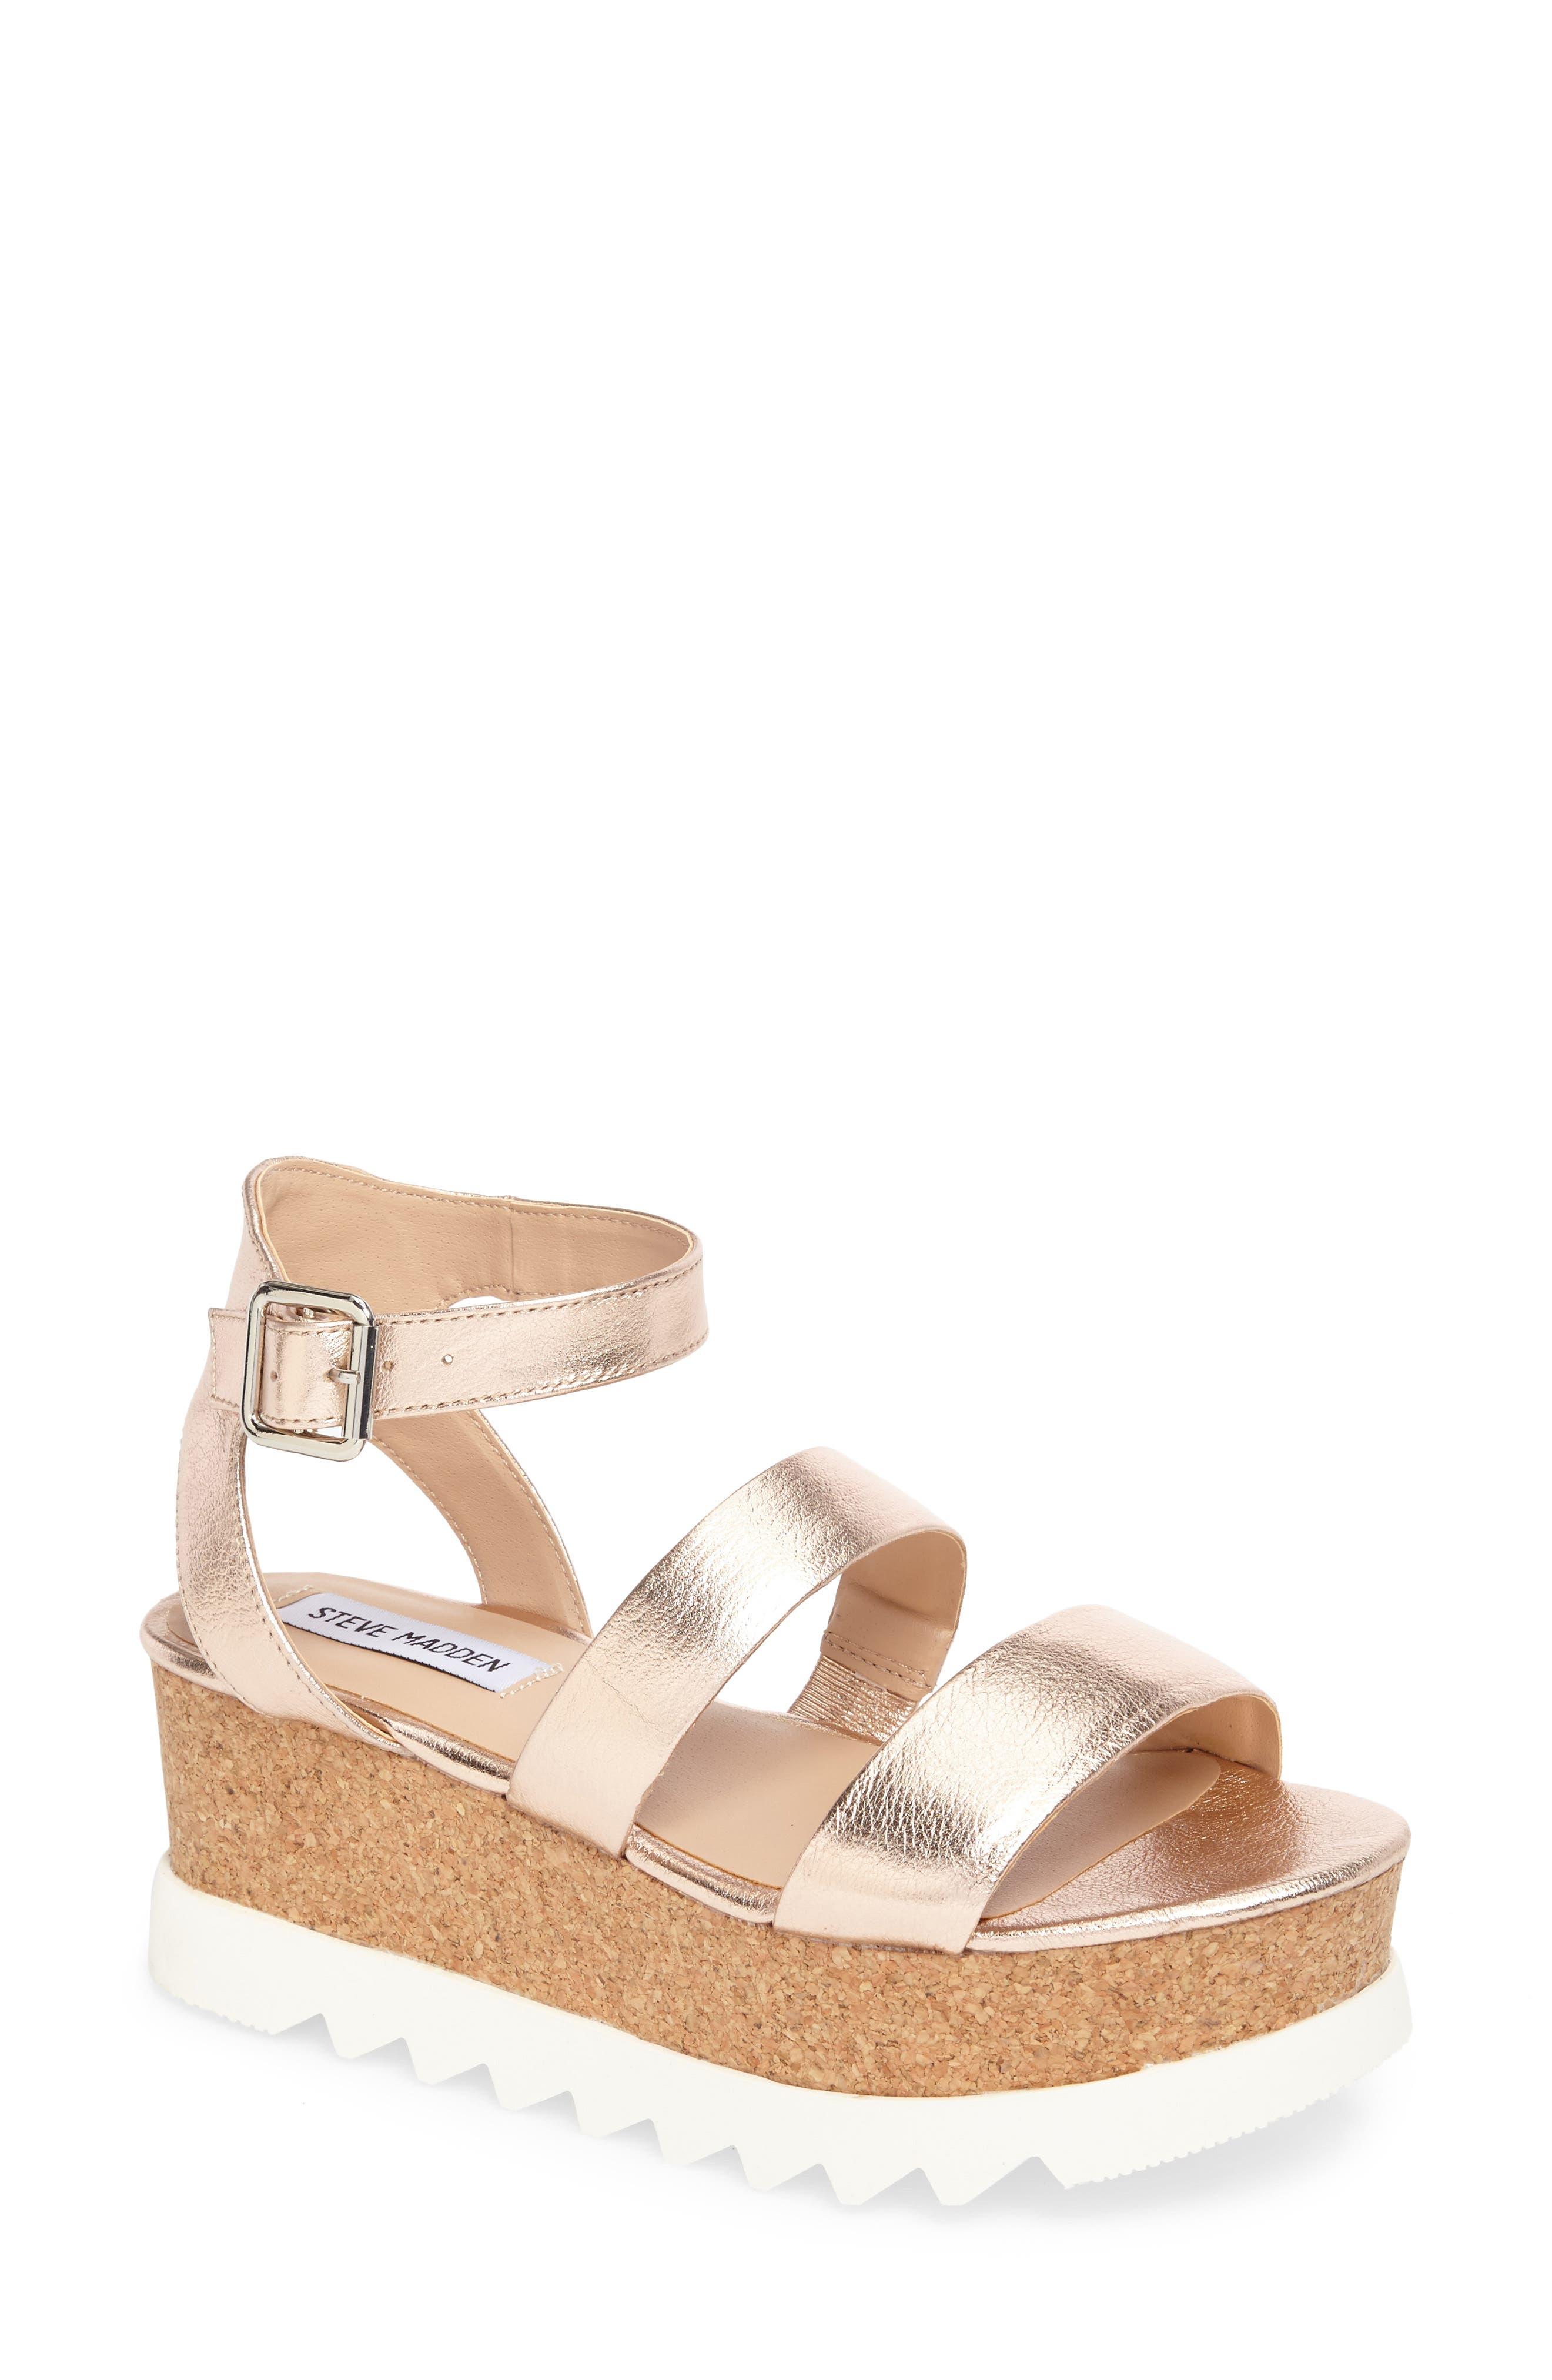 Kirsten Layered Platform Sandal,                             Main thumbnail 1, color,                             Rose Leather